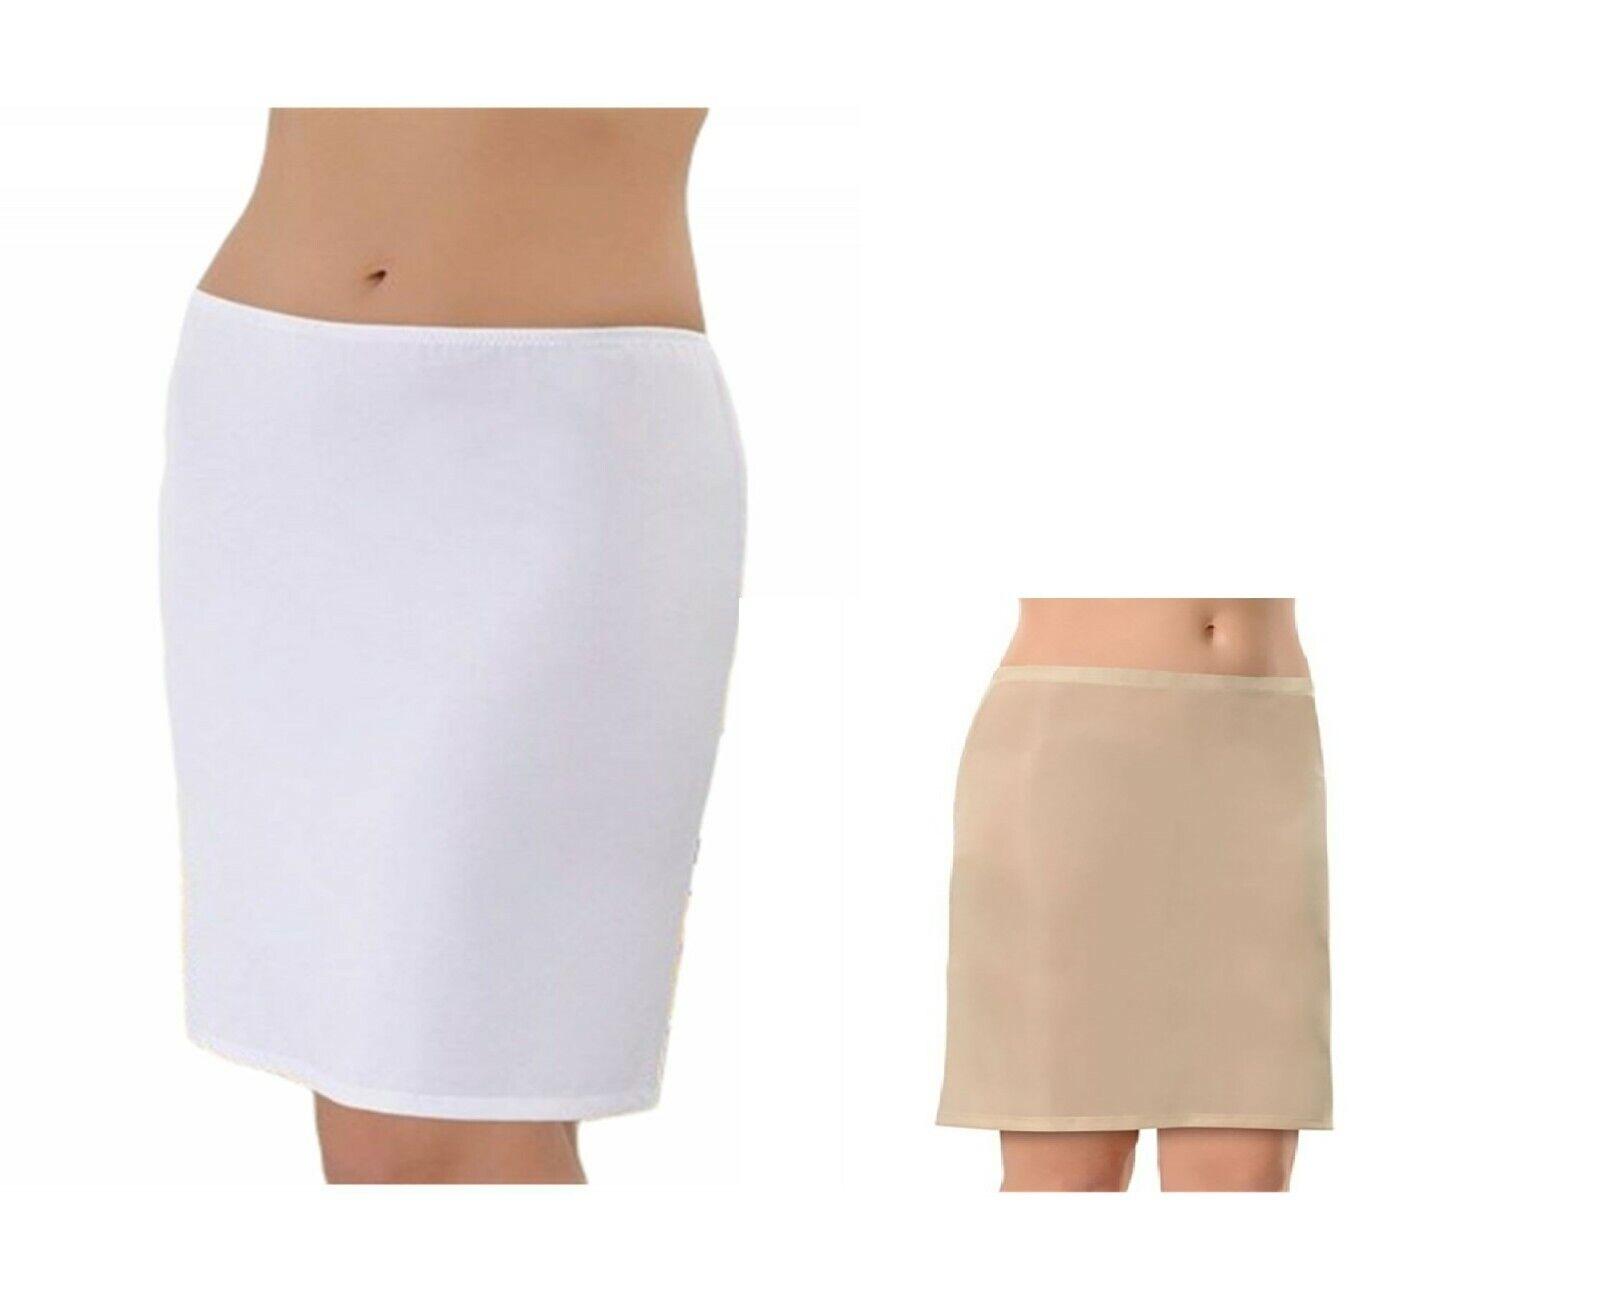 Damen Unterrock mit Gummizug Underskirt Jupon Kurz Mini Unterkleid Lingerie 2900